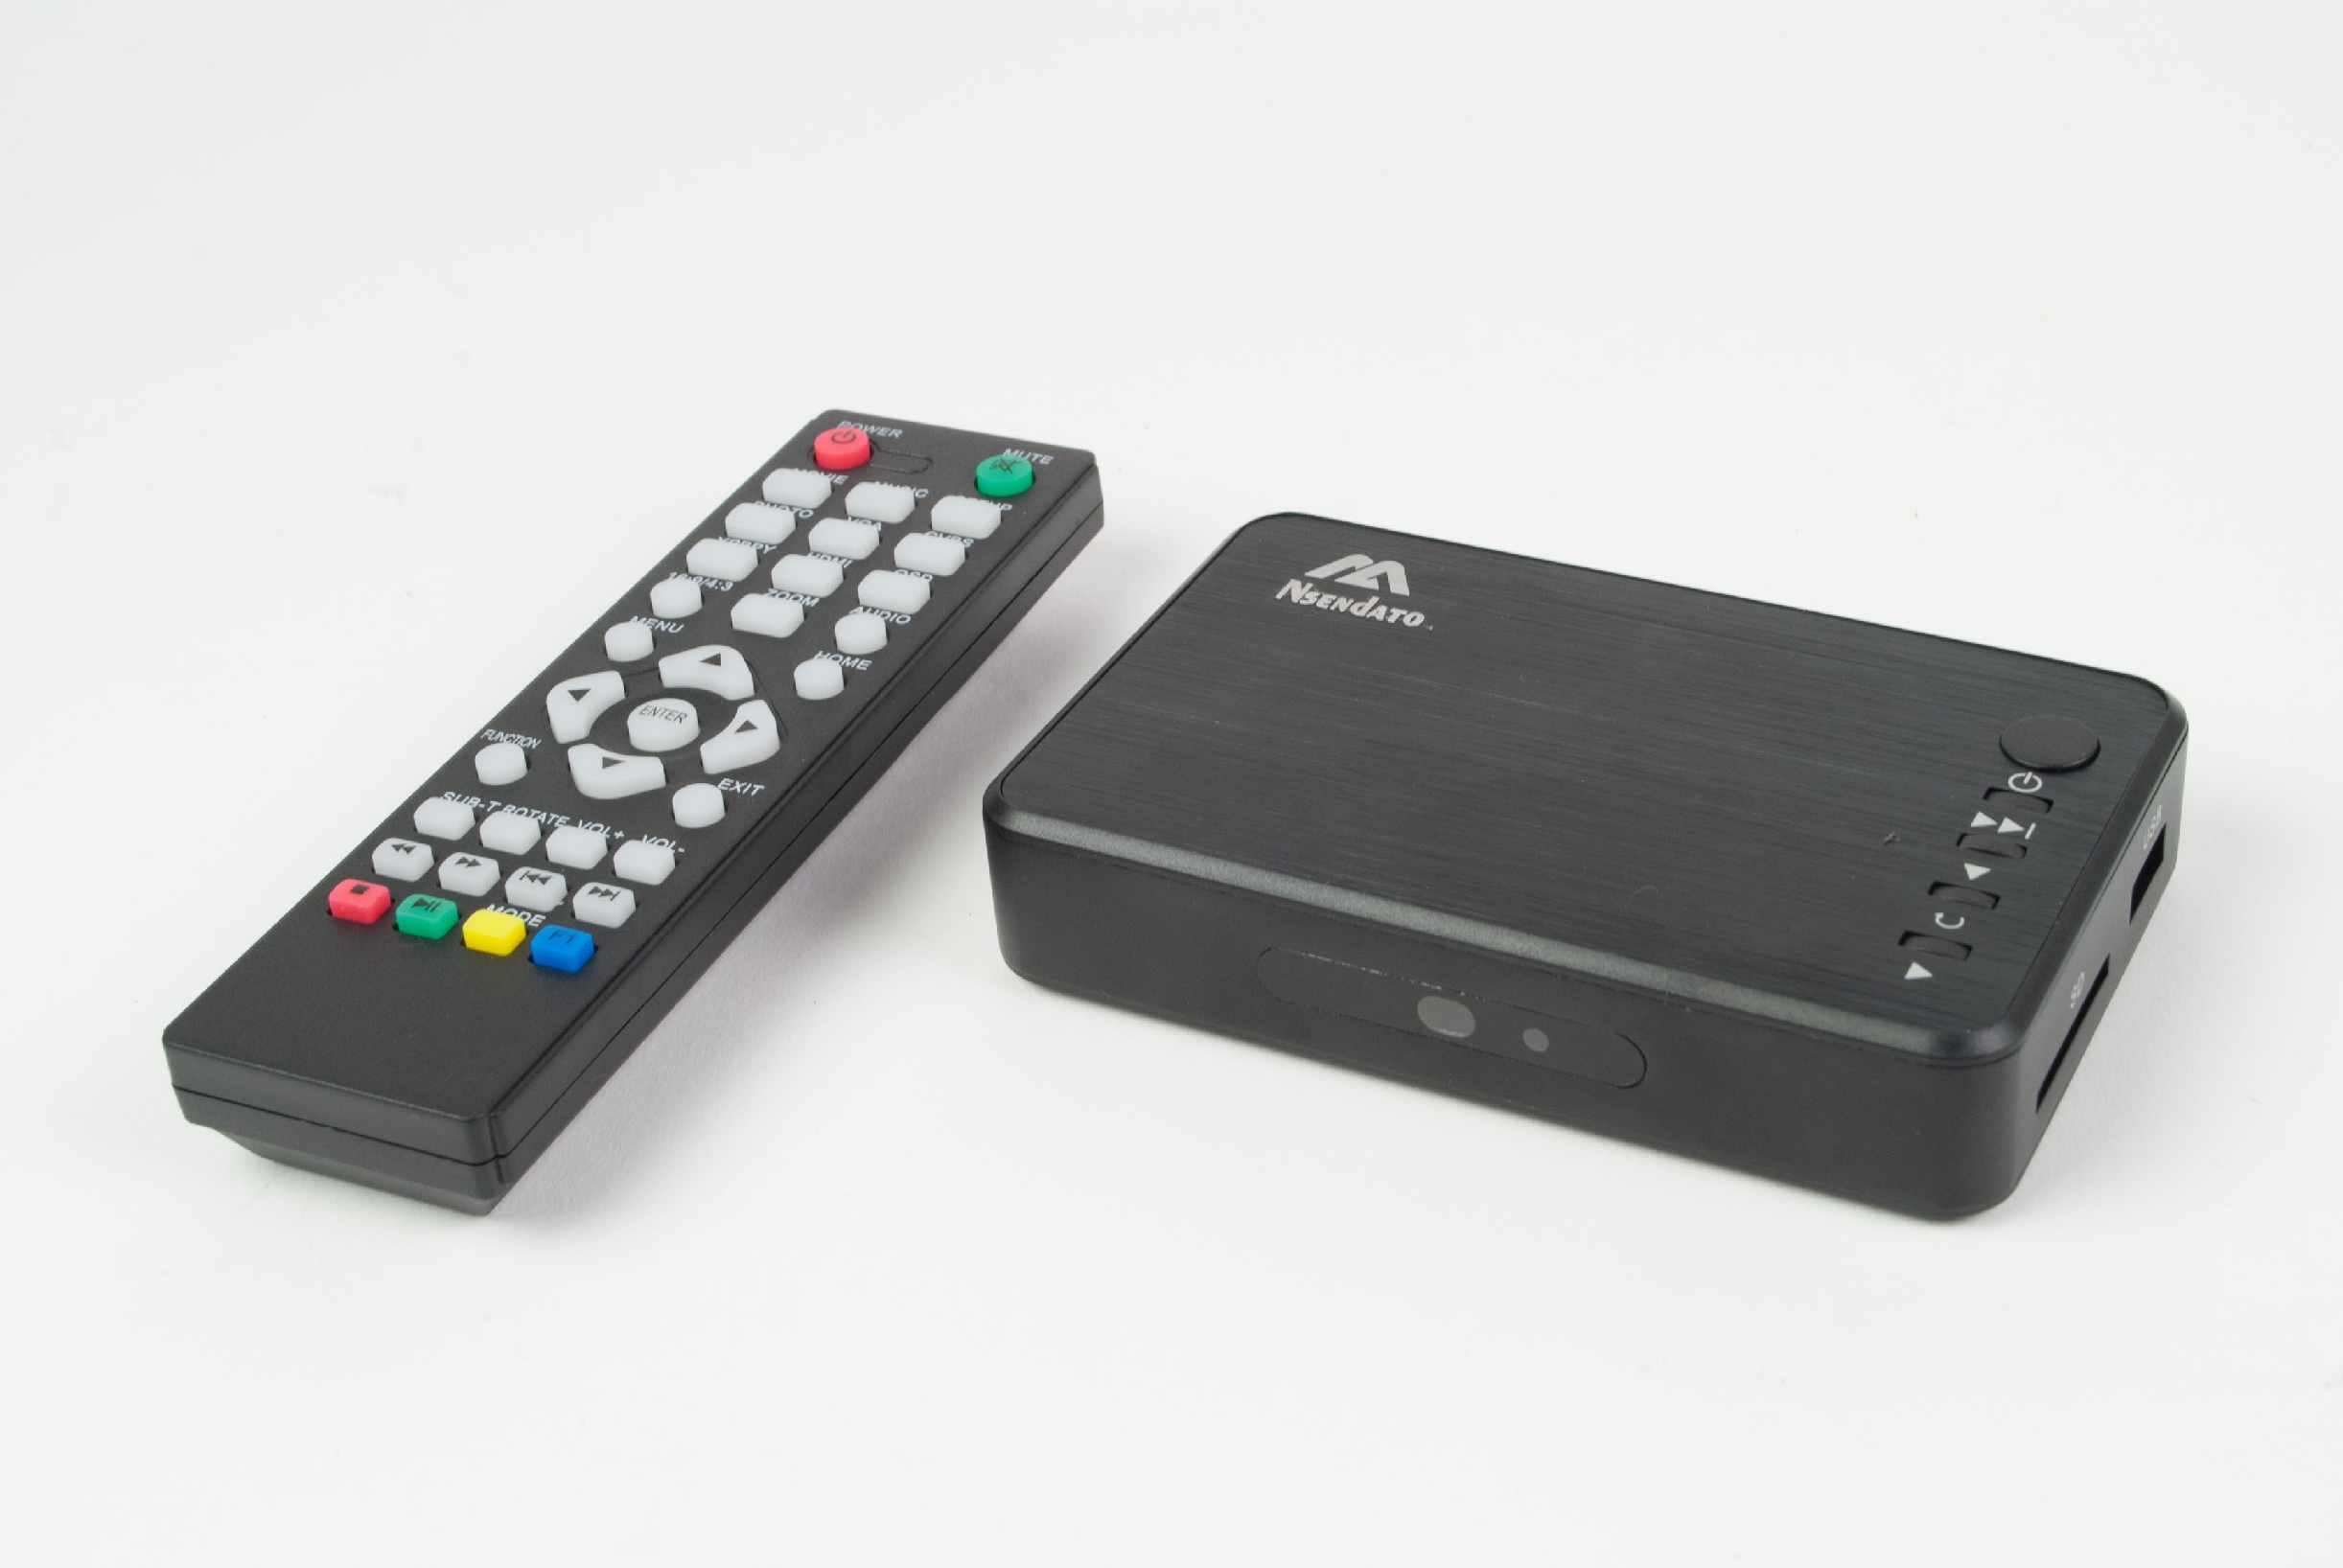 Nsendato Full HD media player - S1365 (nieuw)